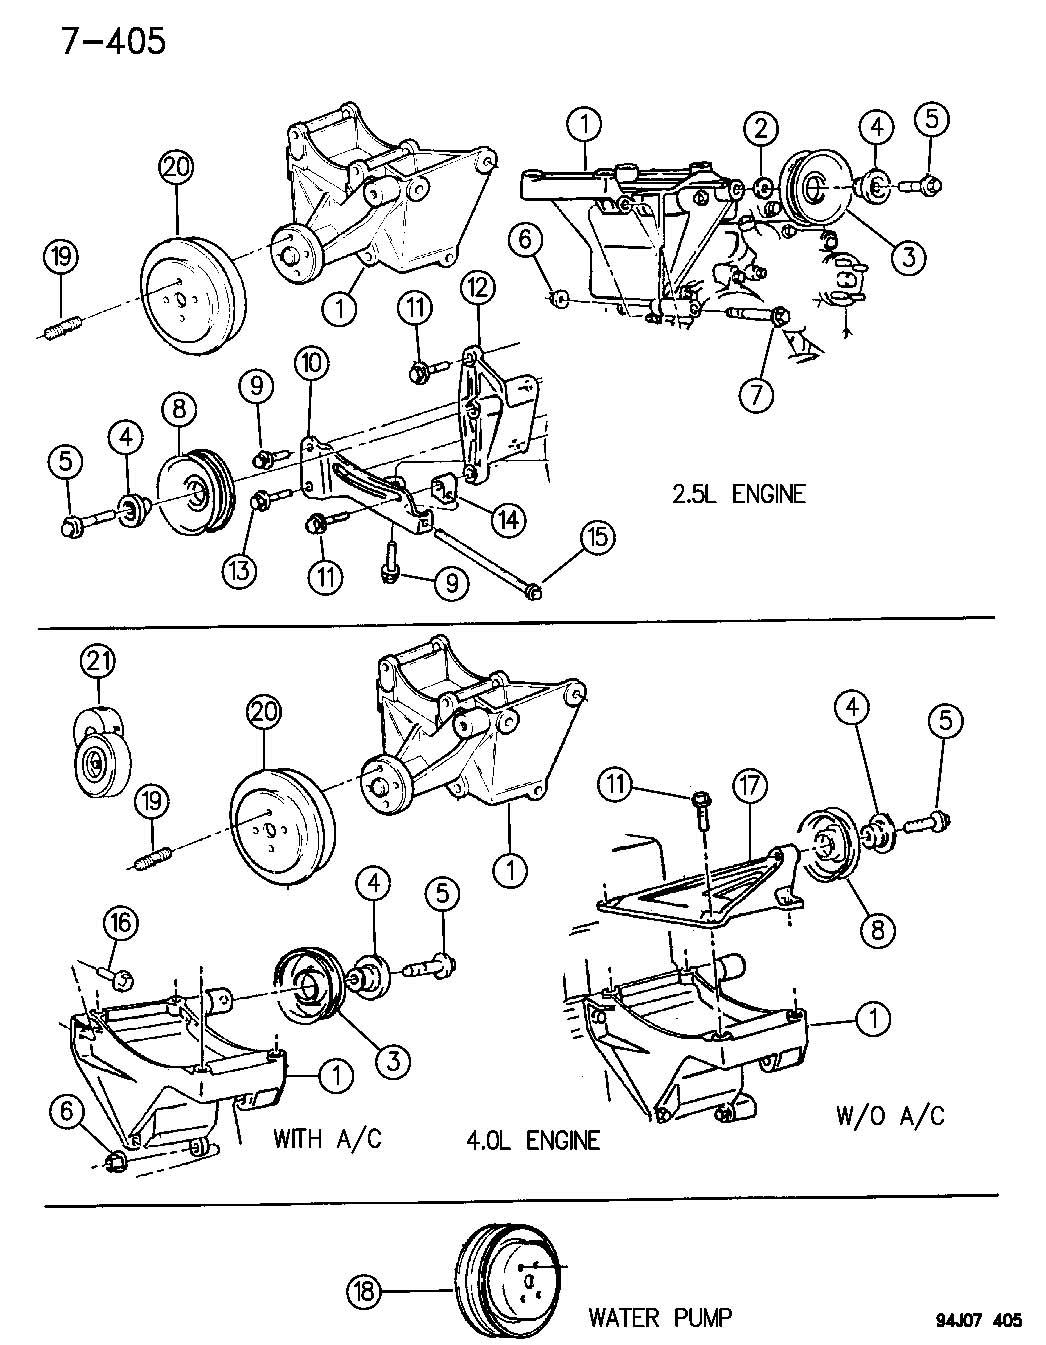 Jeep Patriot Alternator Wiring Diagram Jeep Patriot